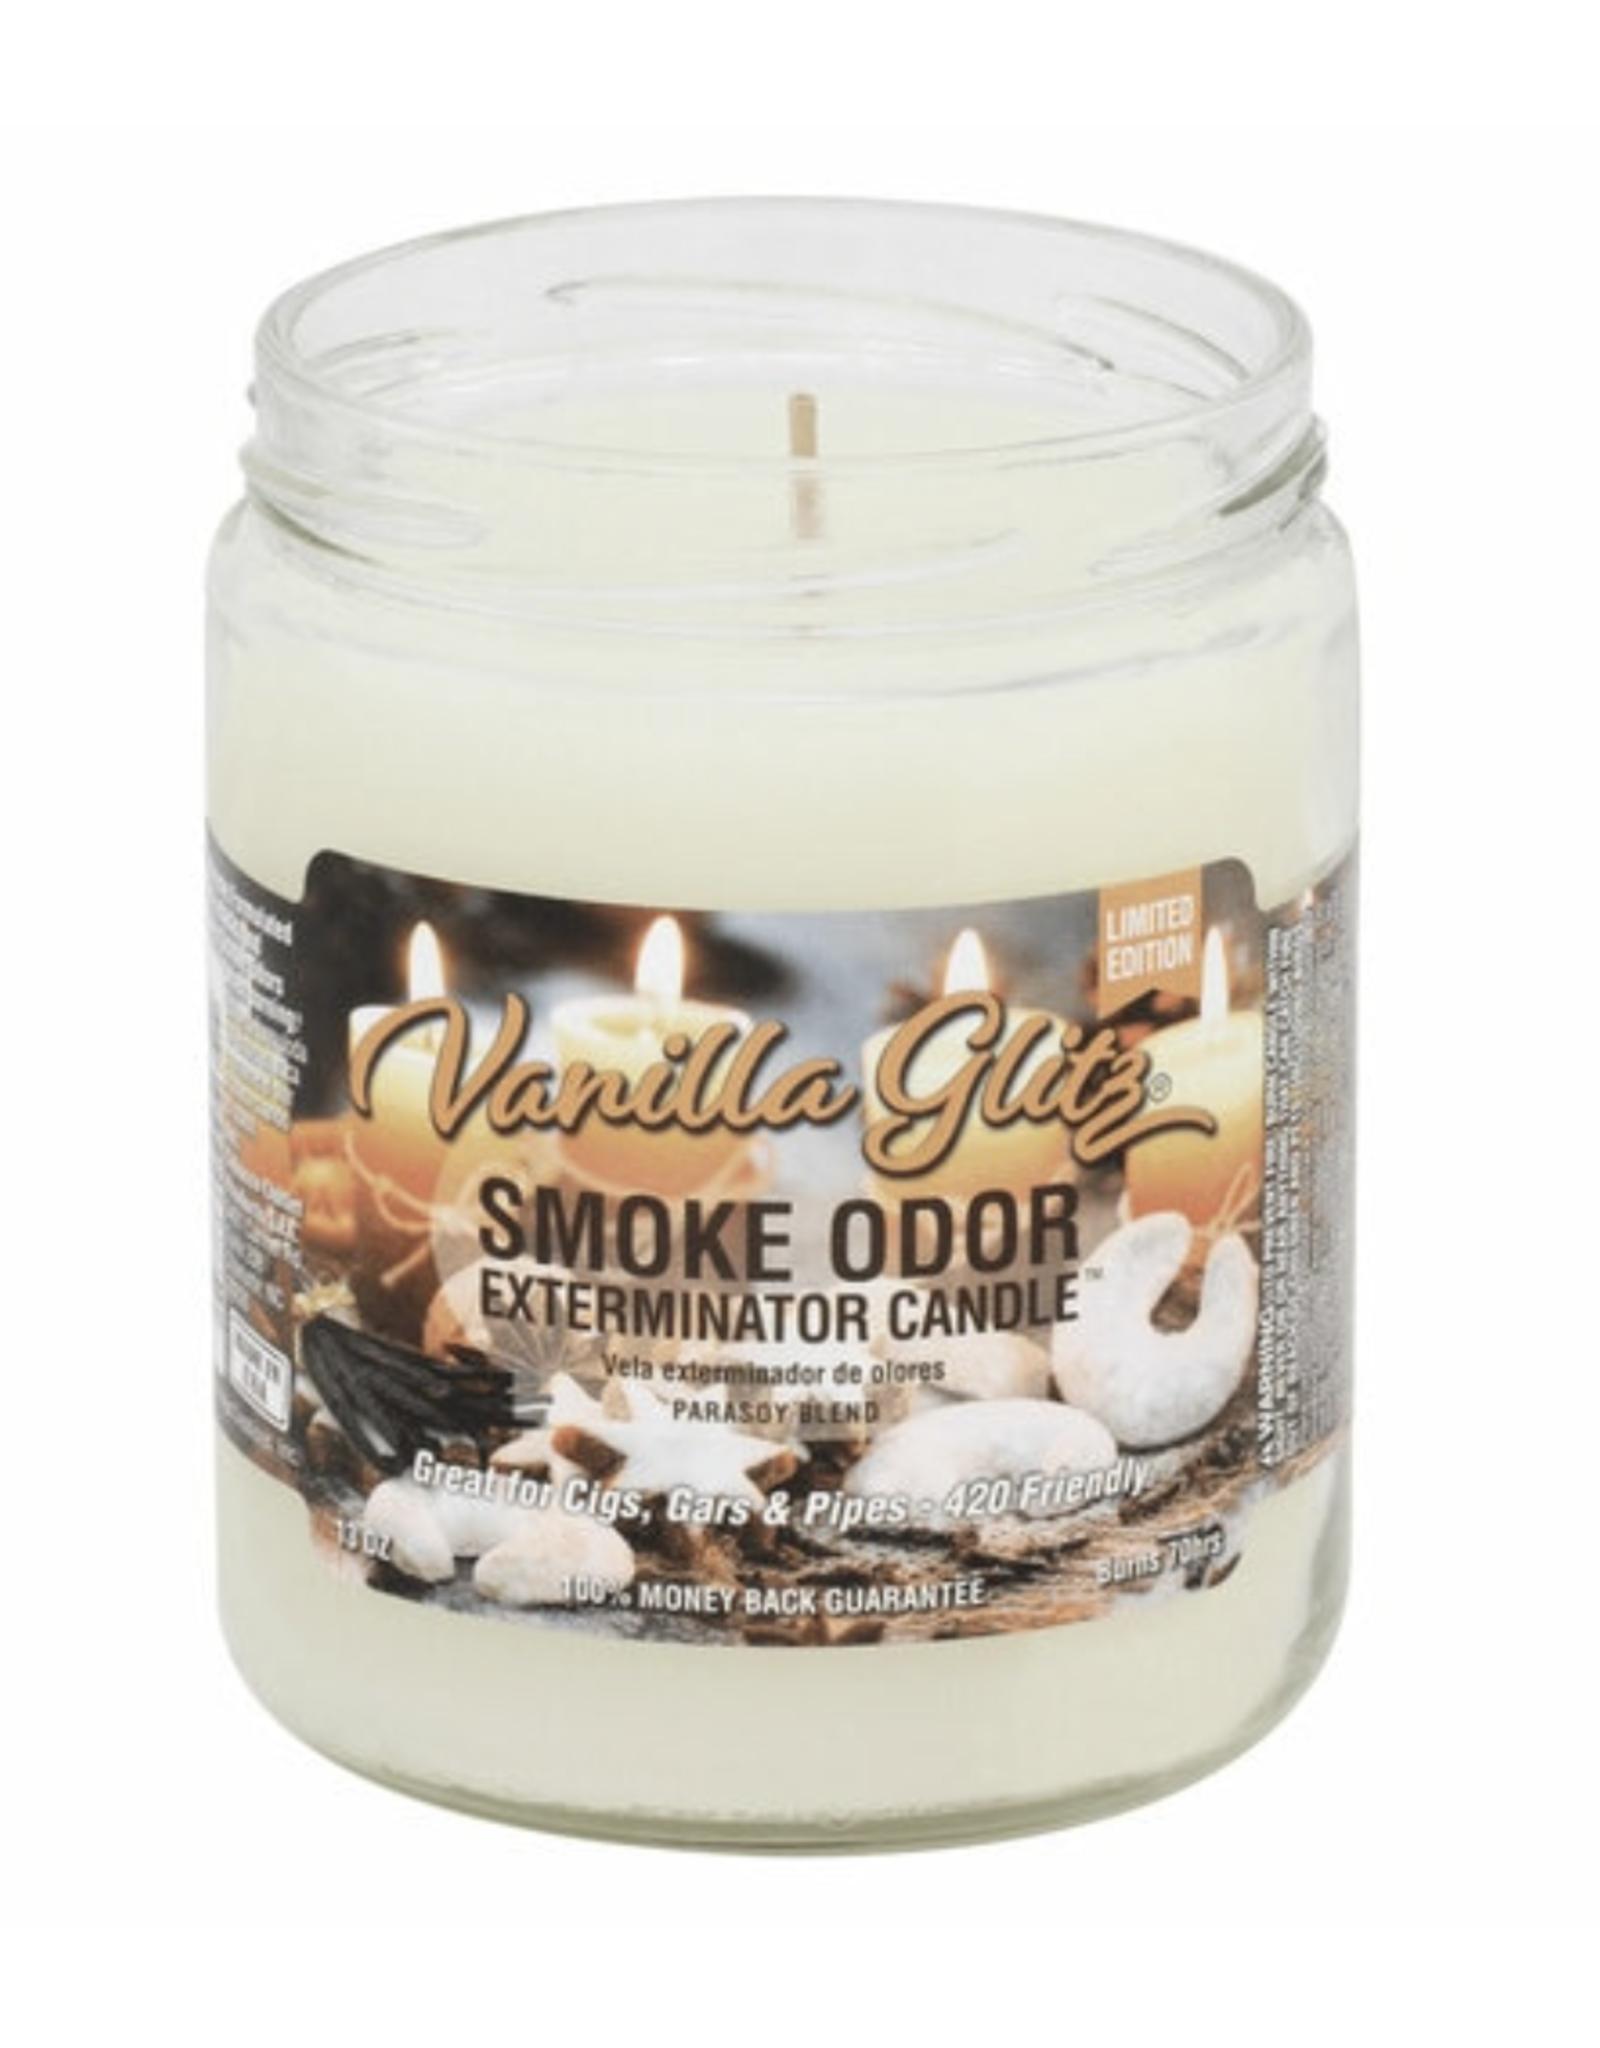 Smoke Odor 13oz. Candle - Vanilla Glitz